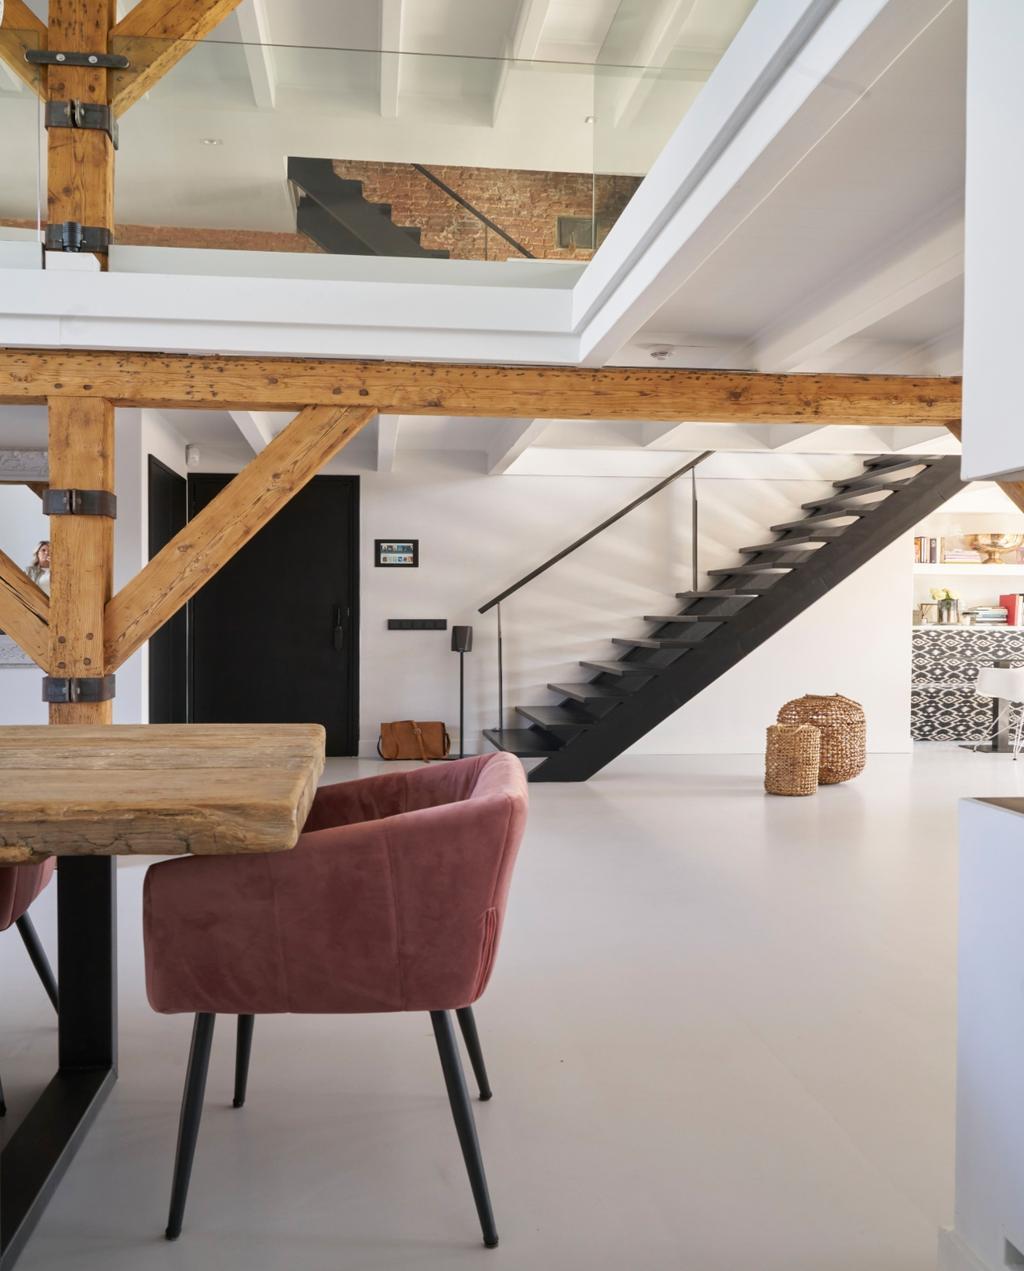 vtwonen 08-2020 | binnenkijken Arnhem roze eetkamerstoel in woonkamer met trap